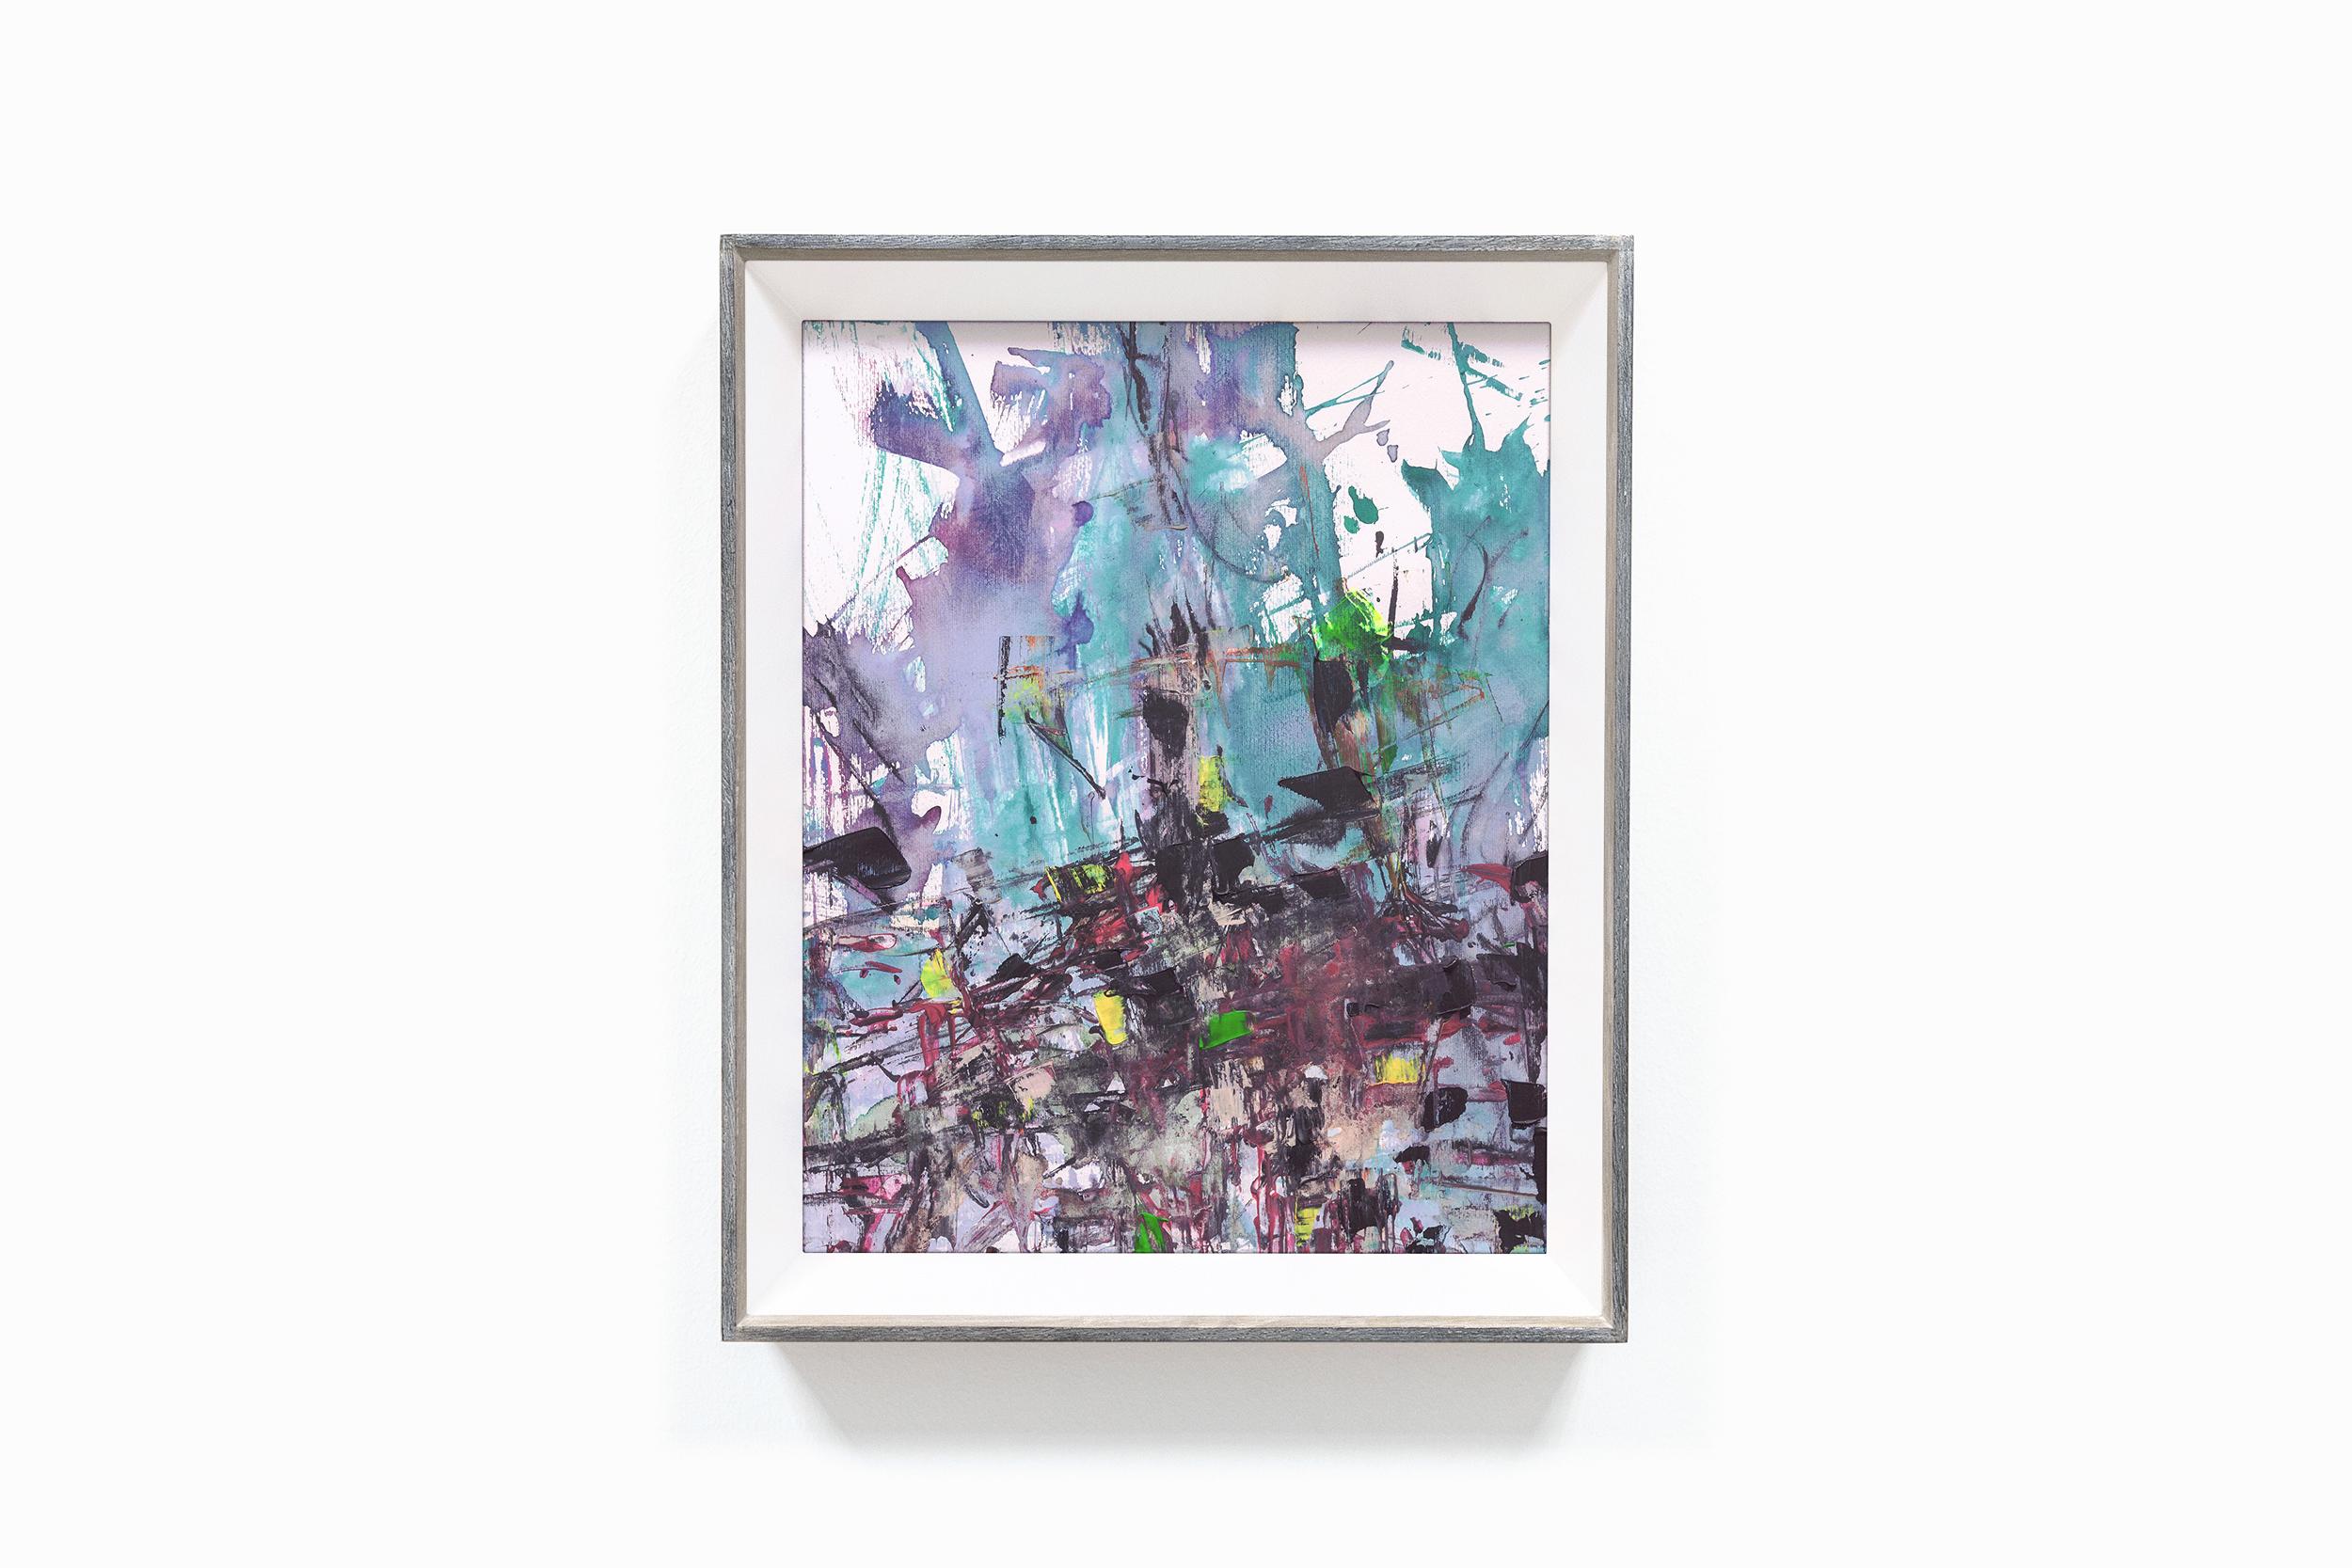 bonjourmolotov+Faded+waltzes+Illustration+Ilustracao+painting+pintura+acrylic+acrílico+canvas+tela+paper+cardboard+mdf+Andre+Gigante+N6.jpg